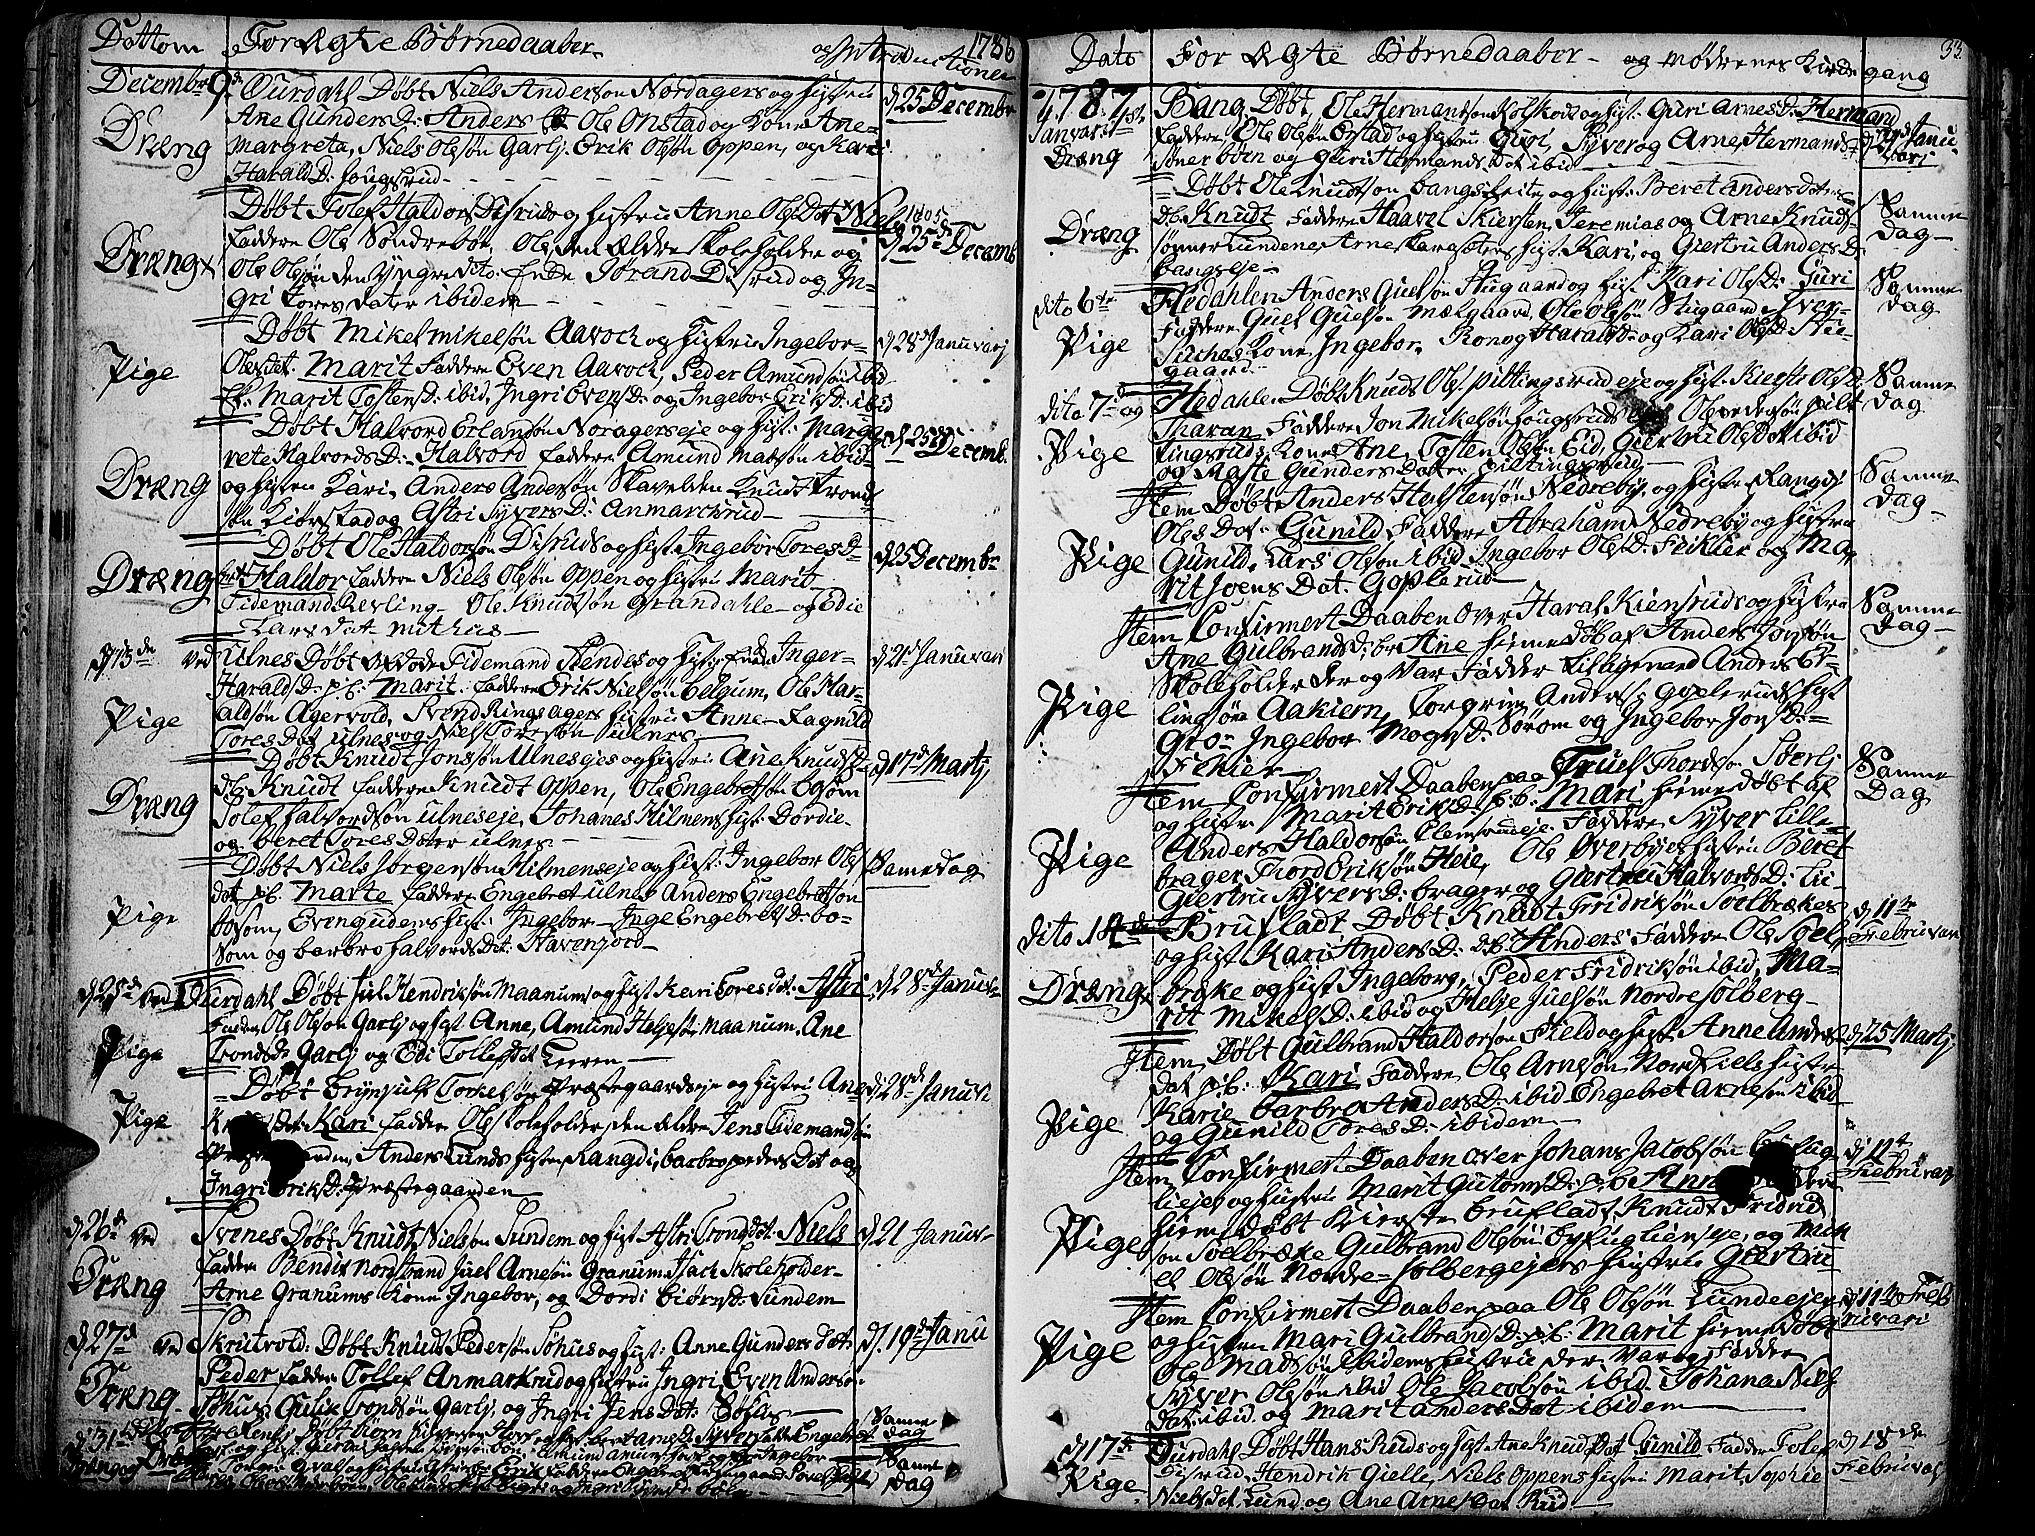 SAH, Aurdal prestekontor, Ministerialbok nr. 6, 1781-1804, s. 33